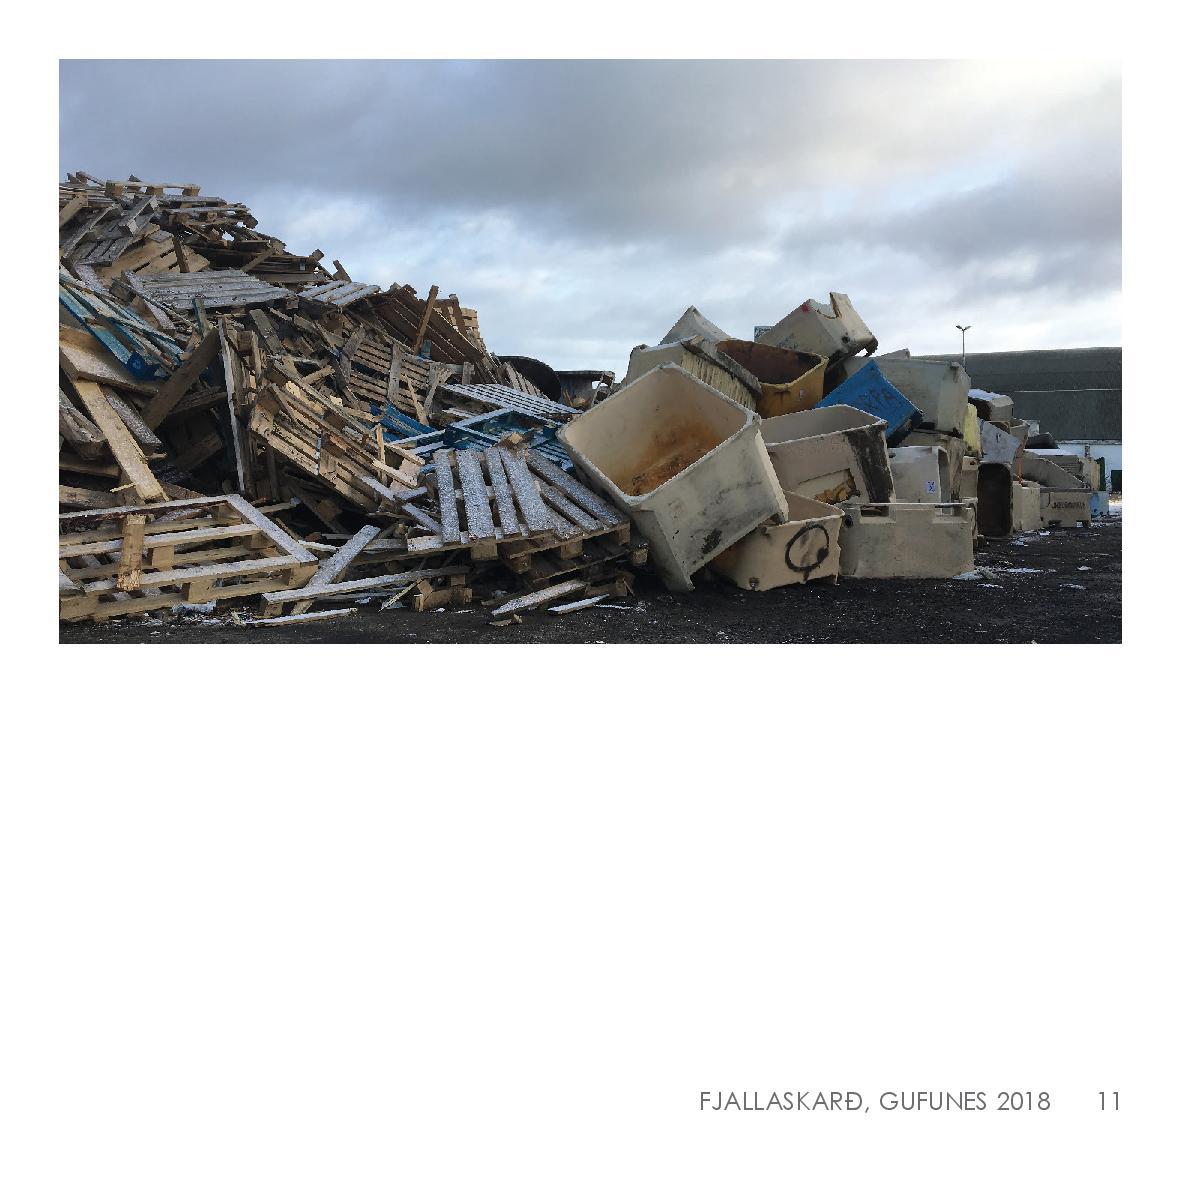 39433_GudrunNielsen-page-011.jpg